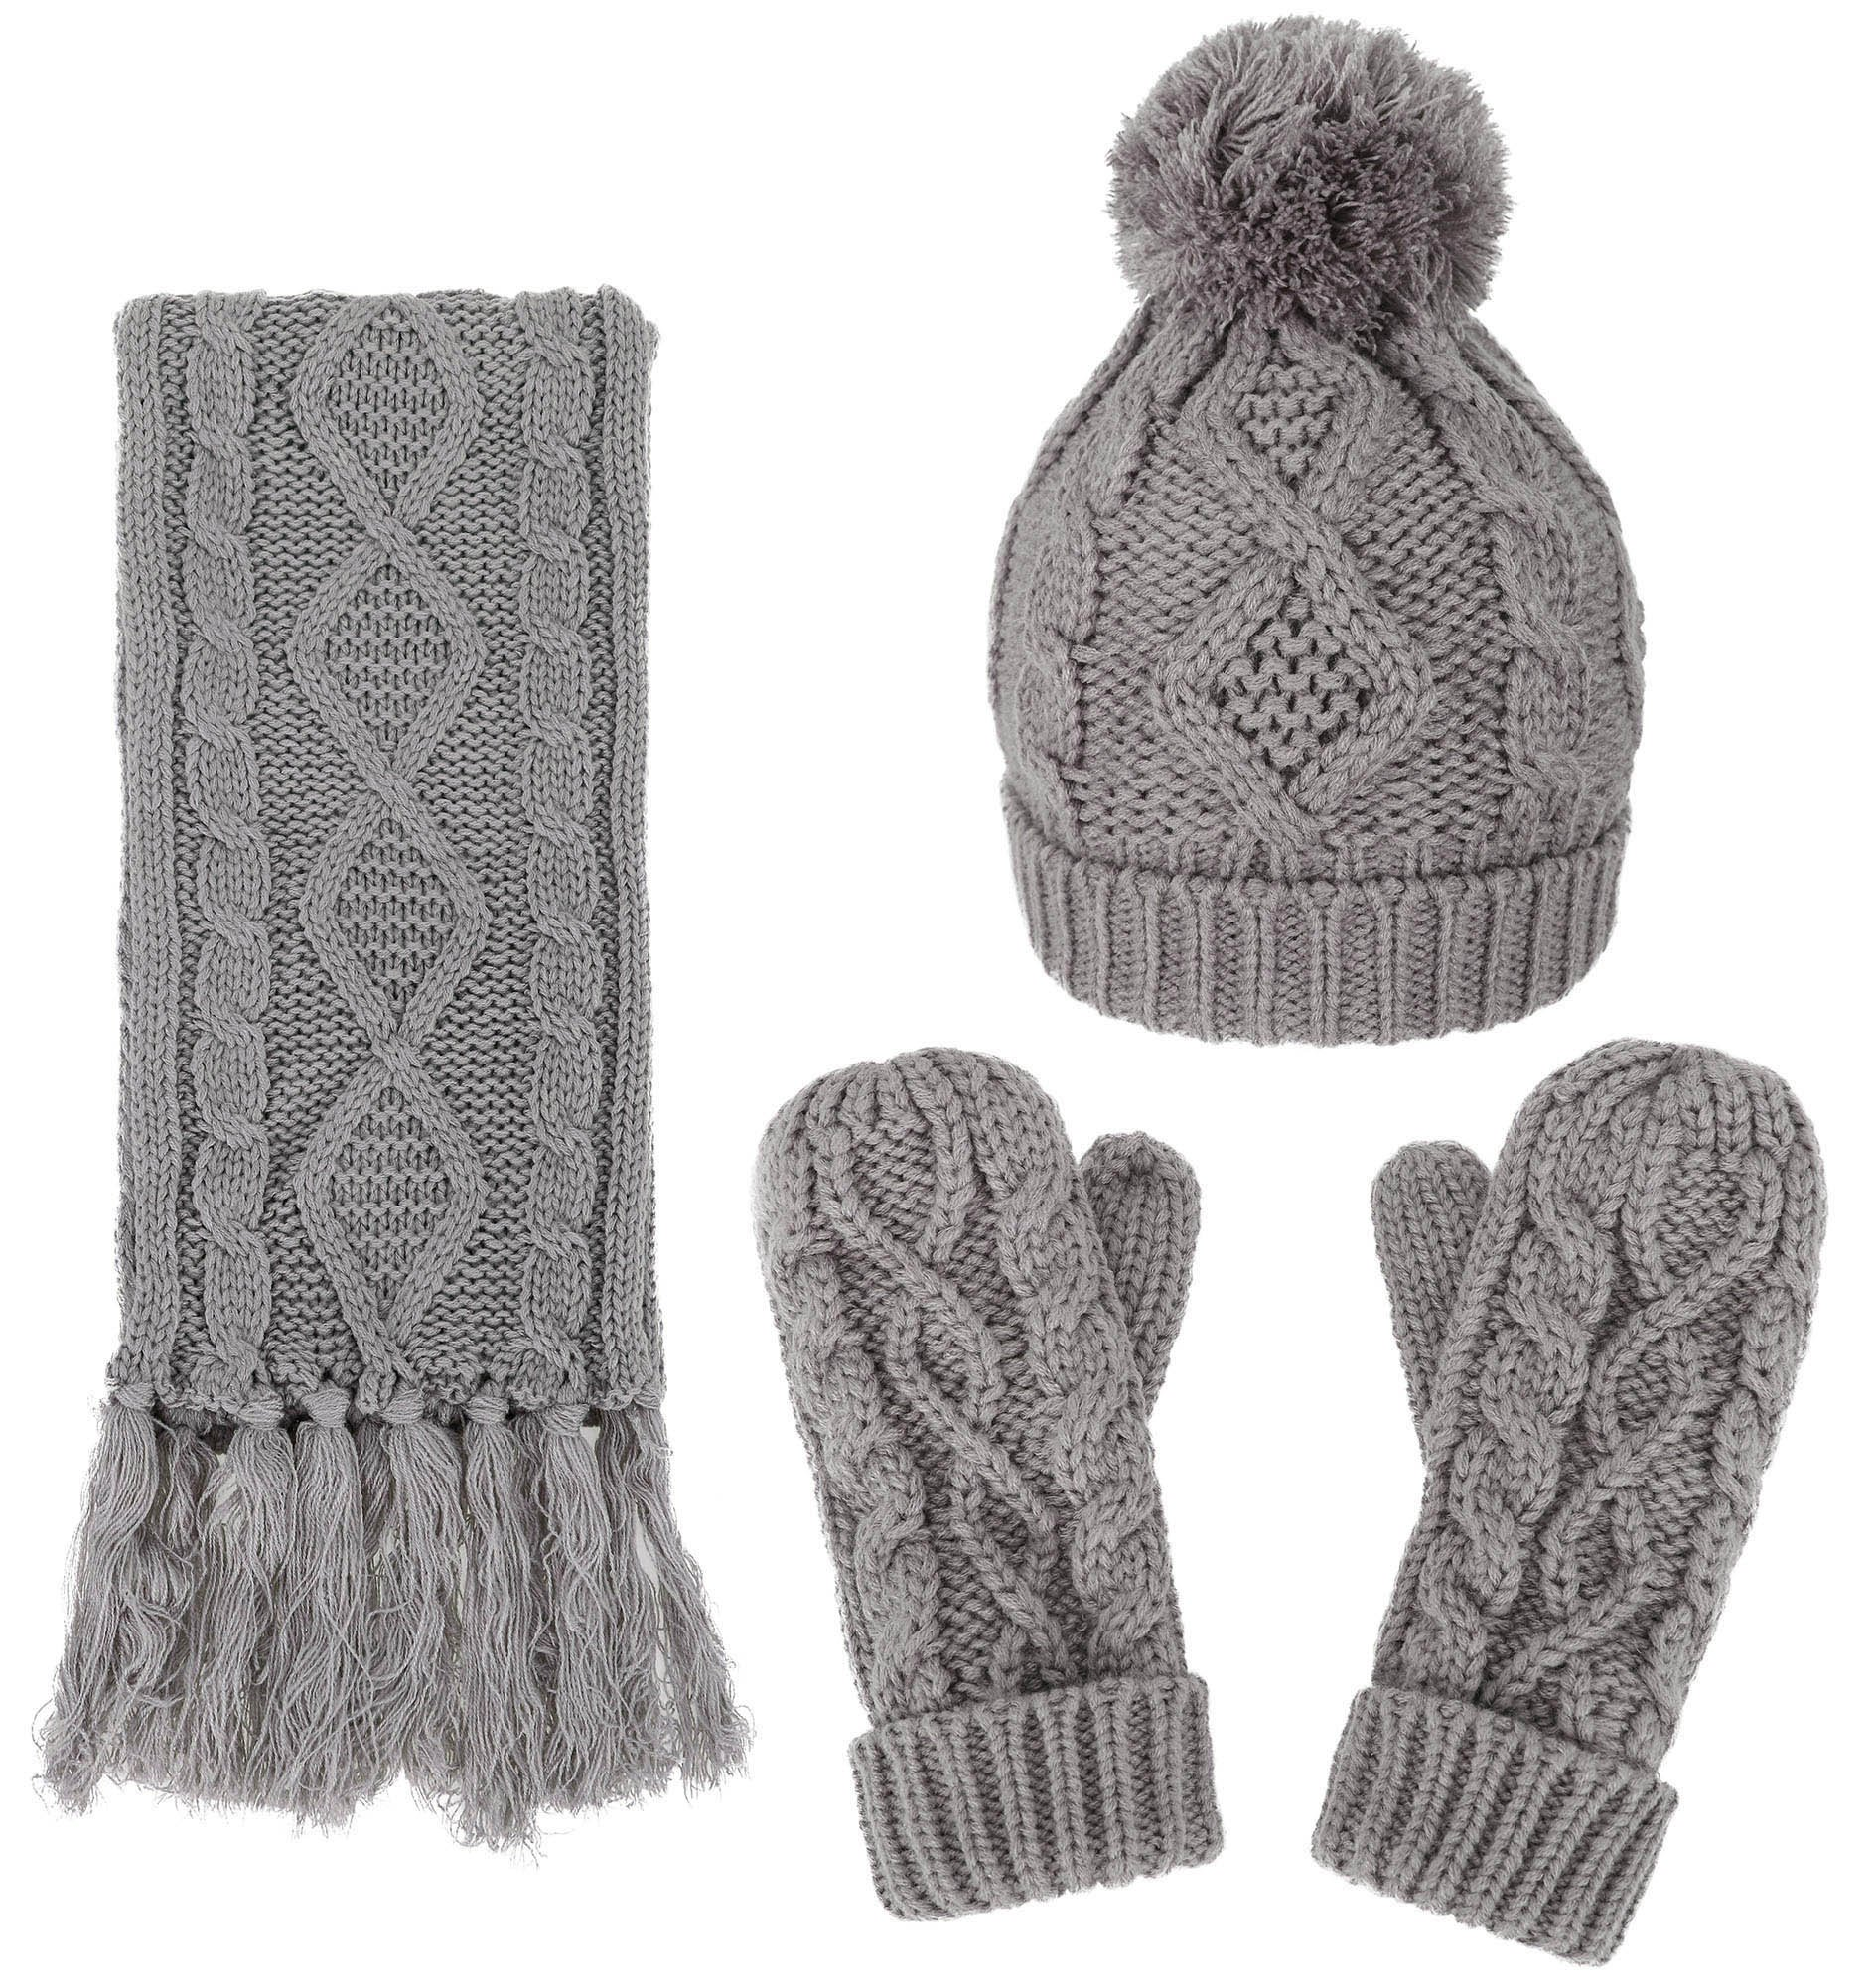 ANDORRA Women Soft Warm Thick Knitted Beanie Scarf & Gloves Winter Set,Grey